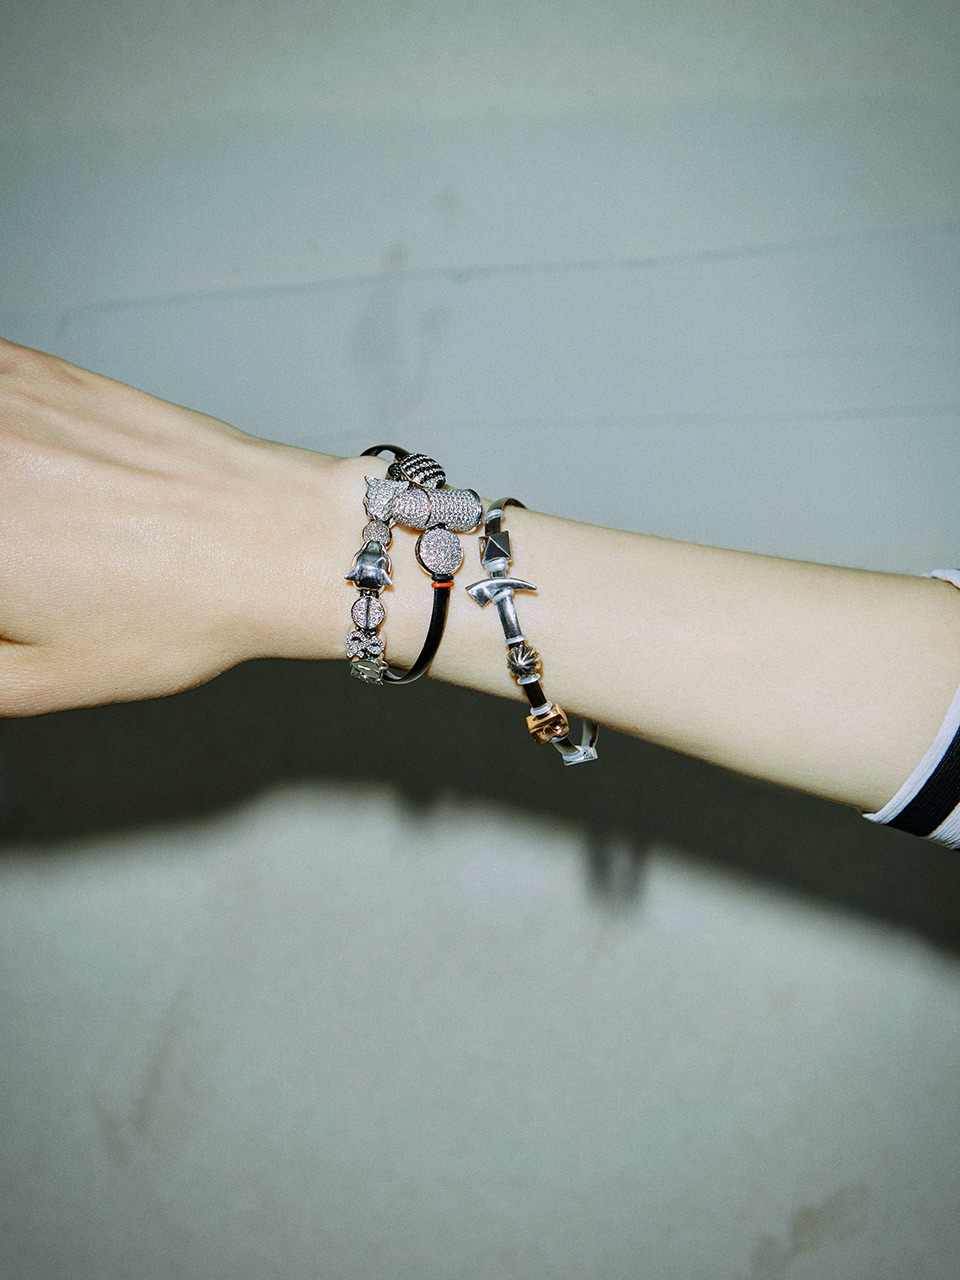 Arild-Links-jewellery-03-1